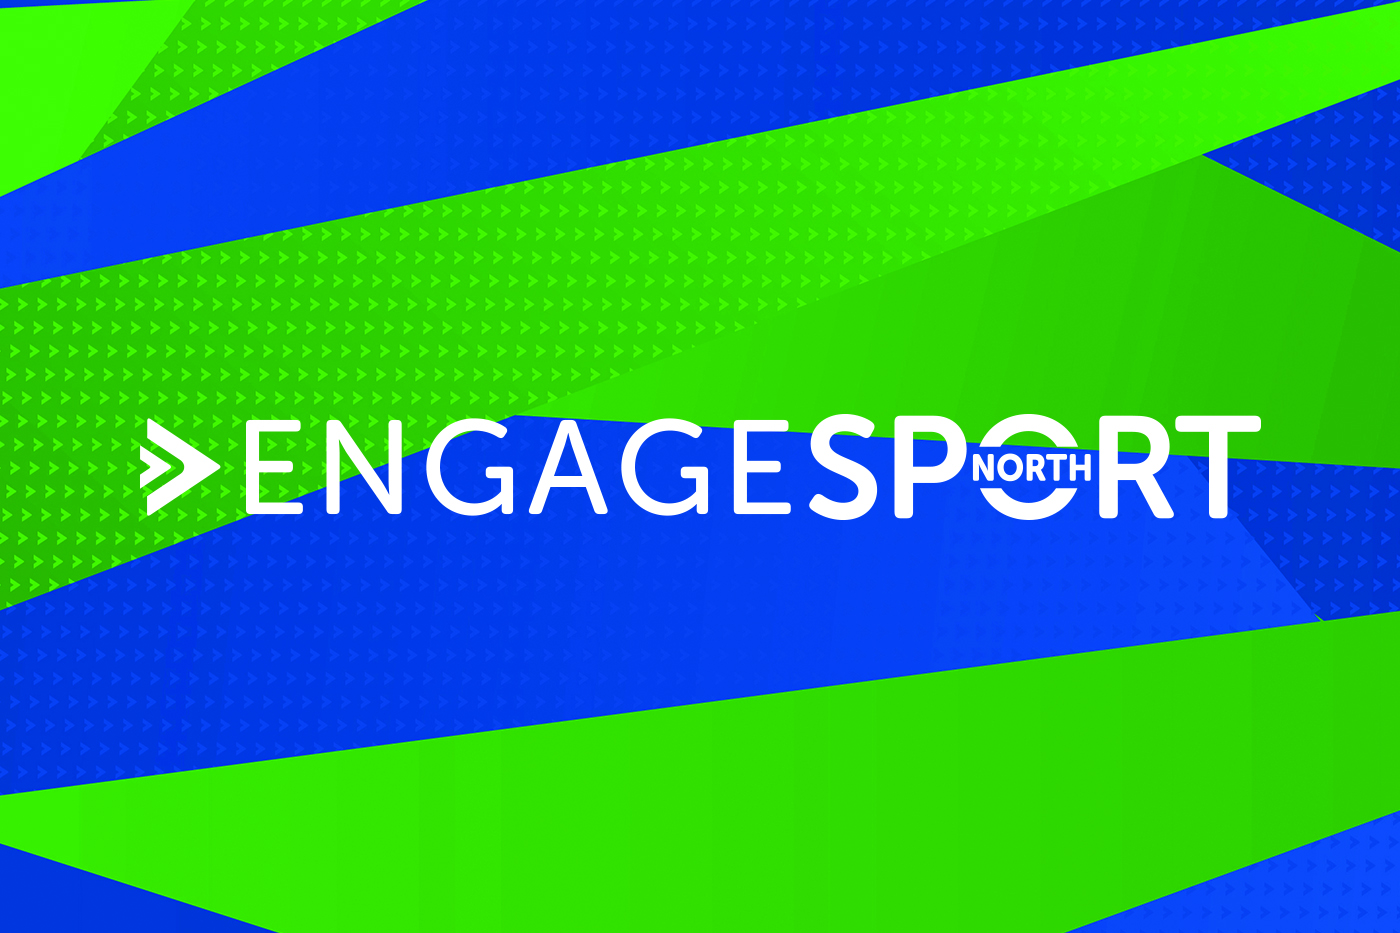 Engage-Sport-North-brand-logo-design-pattern.jpg